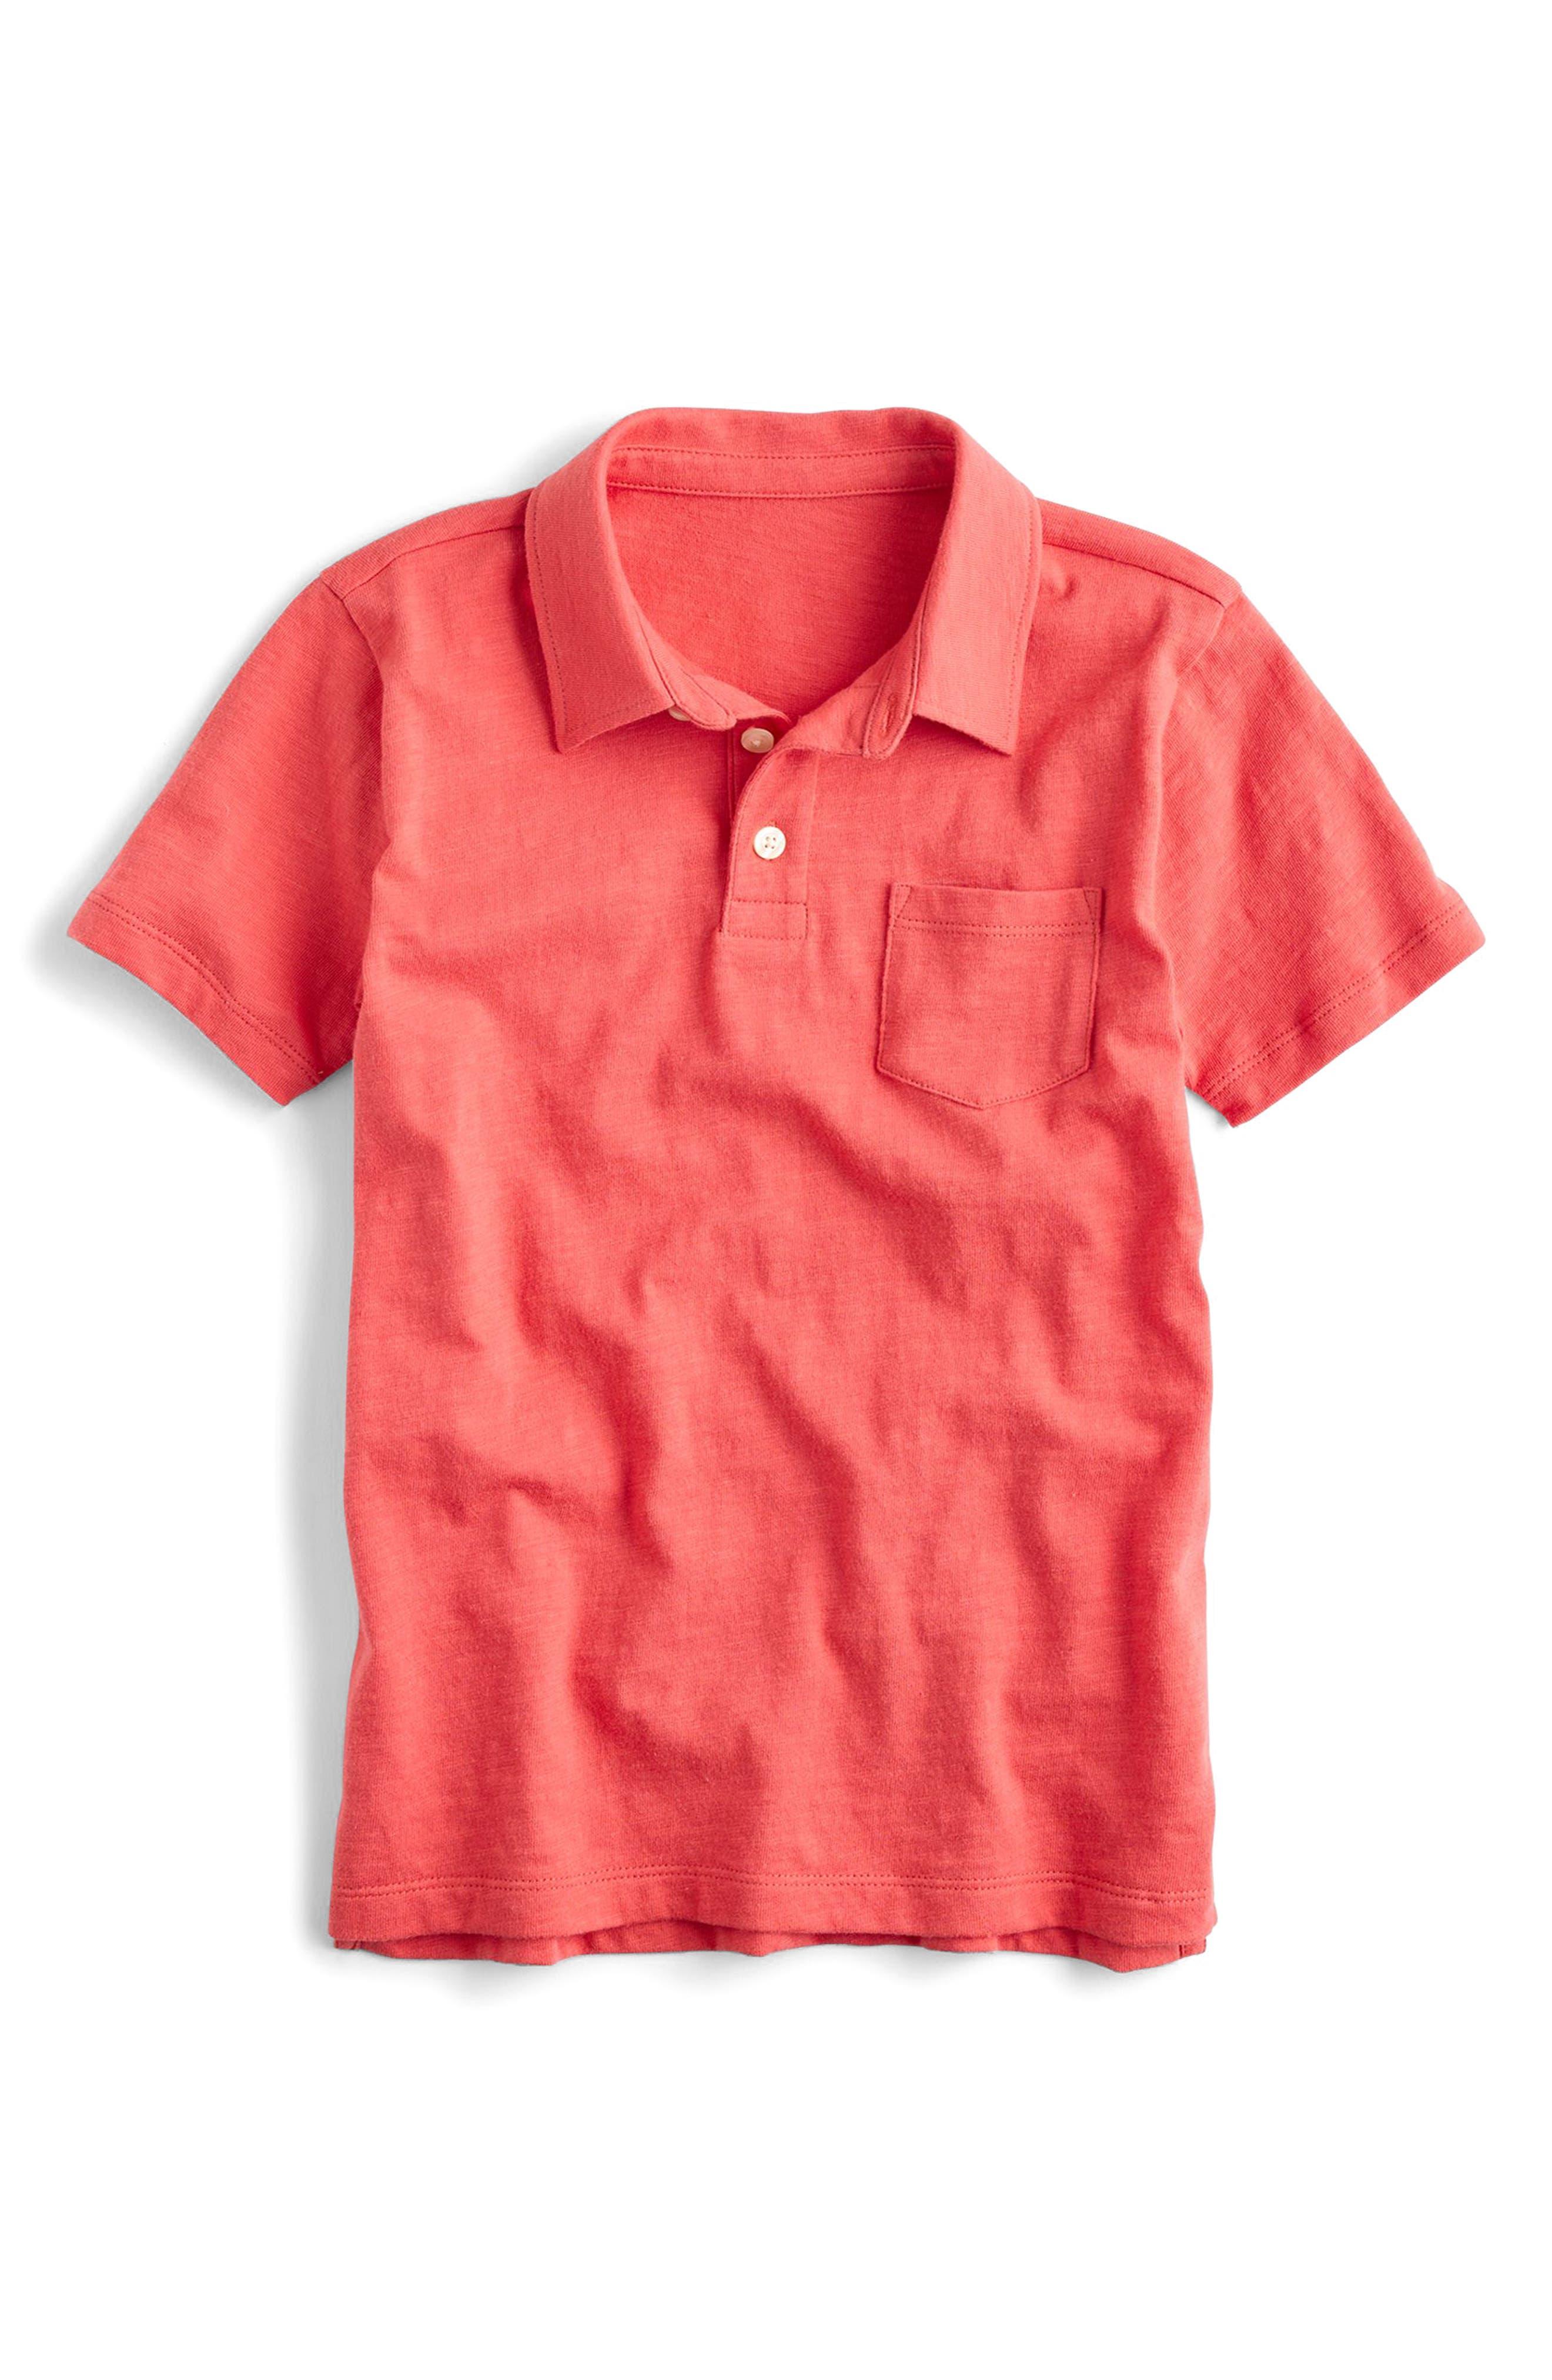 Jersey Polo,                             Main thumbnail 1, color,                             Coral